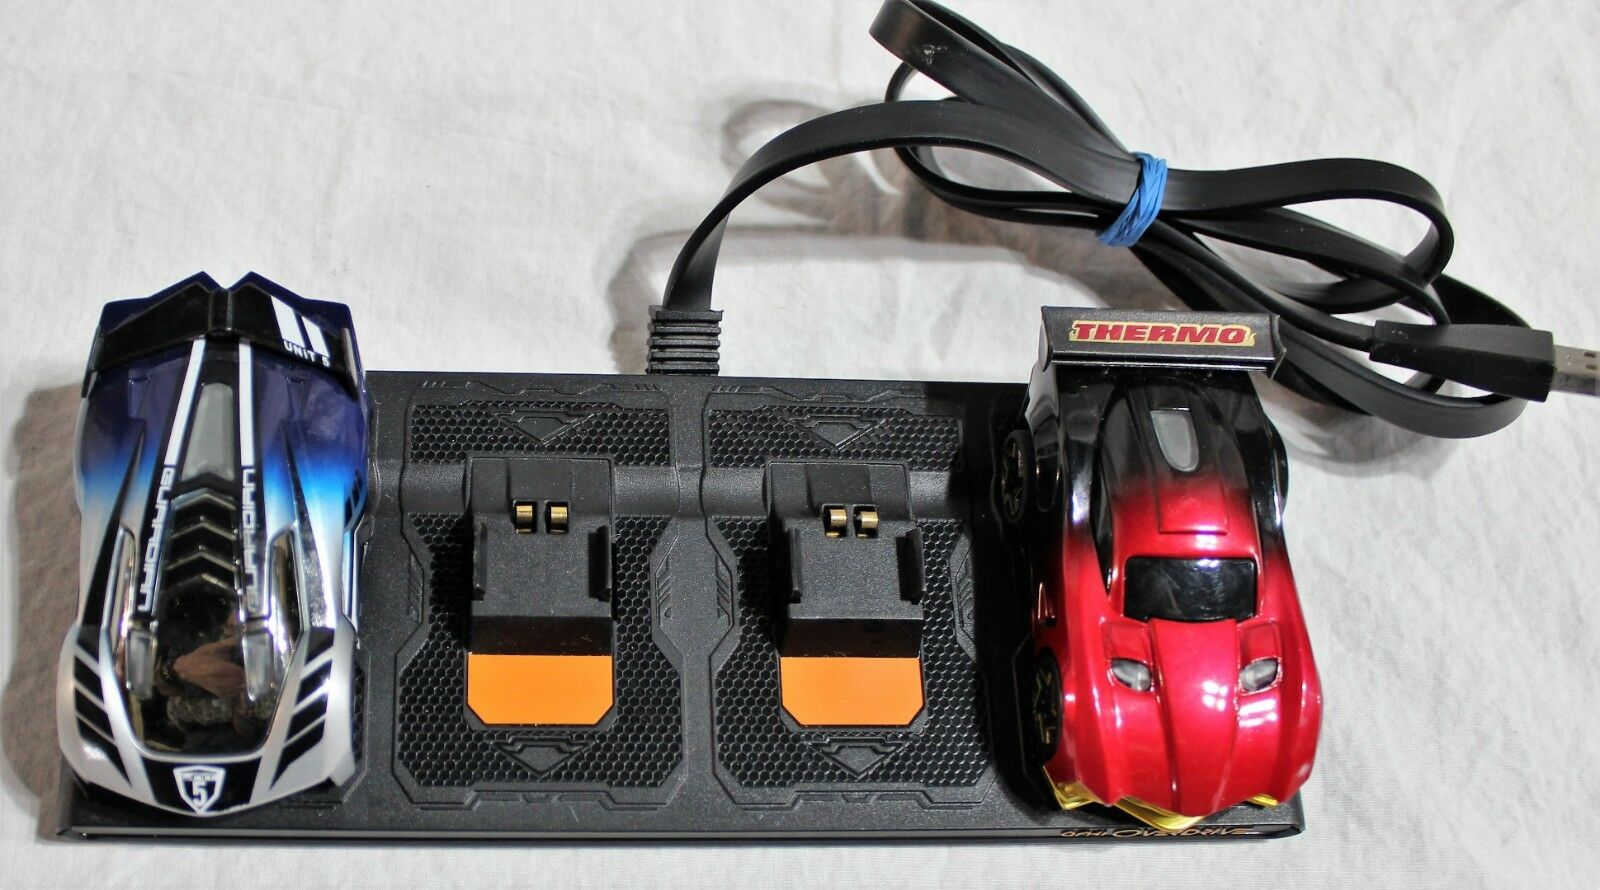 Anki Overdrive Estrellater Kit 4 Thermo Coche de expansión y muelle de Cochega Pista